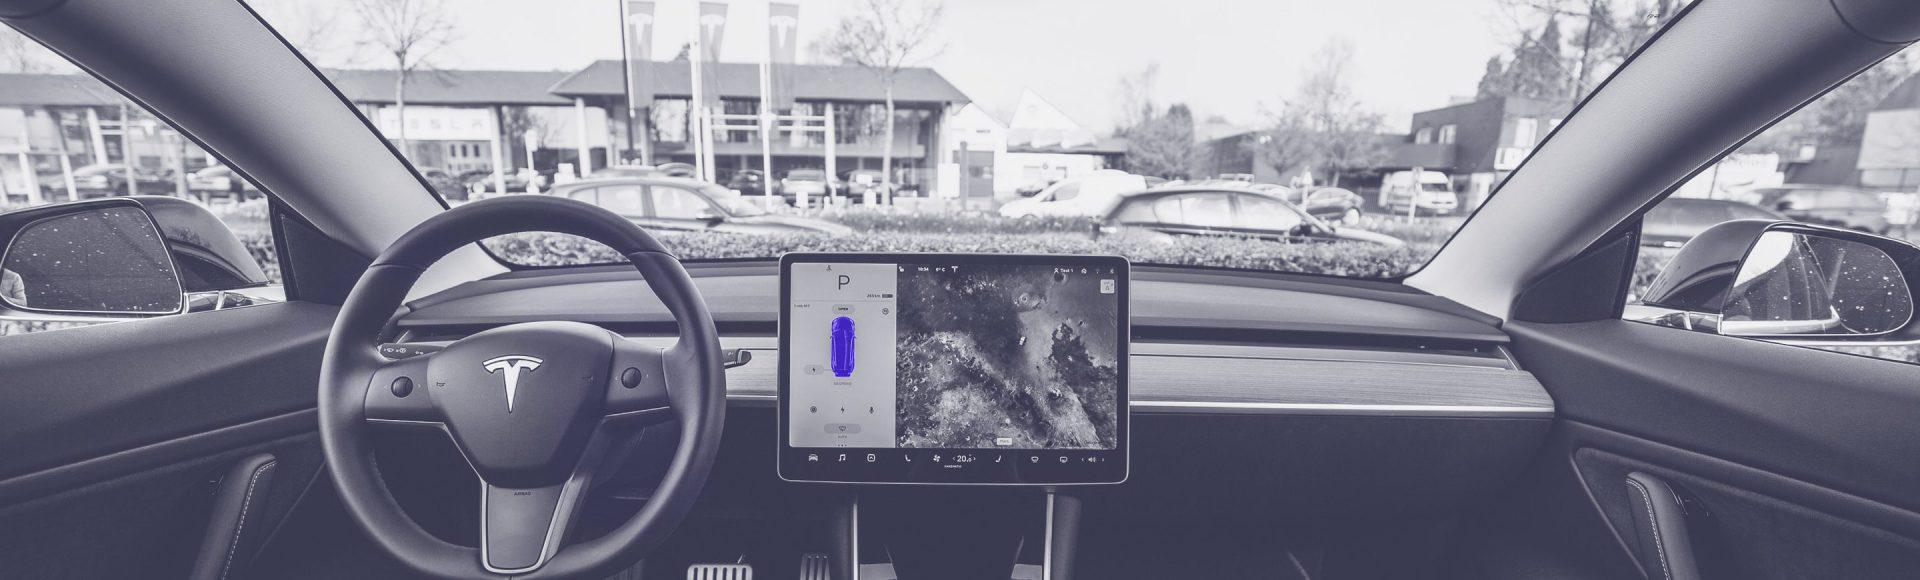 Tesla, Ridehailing, Autonomous